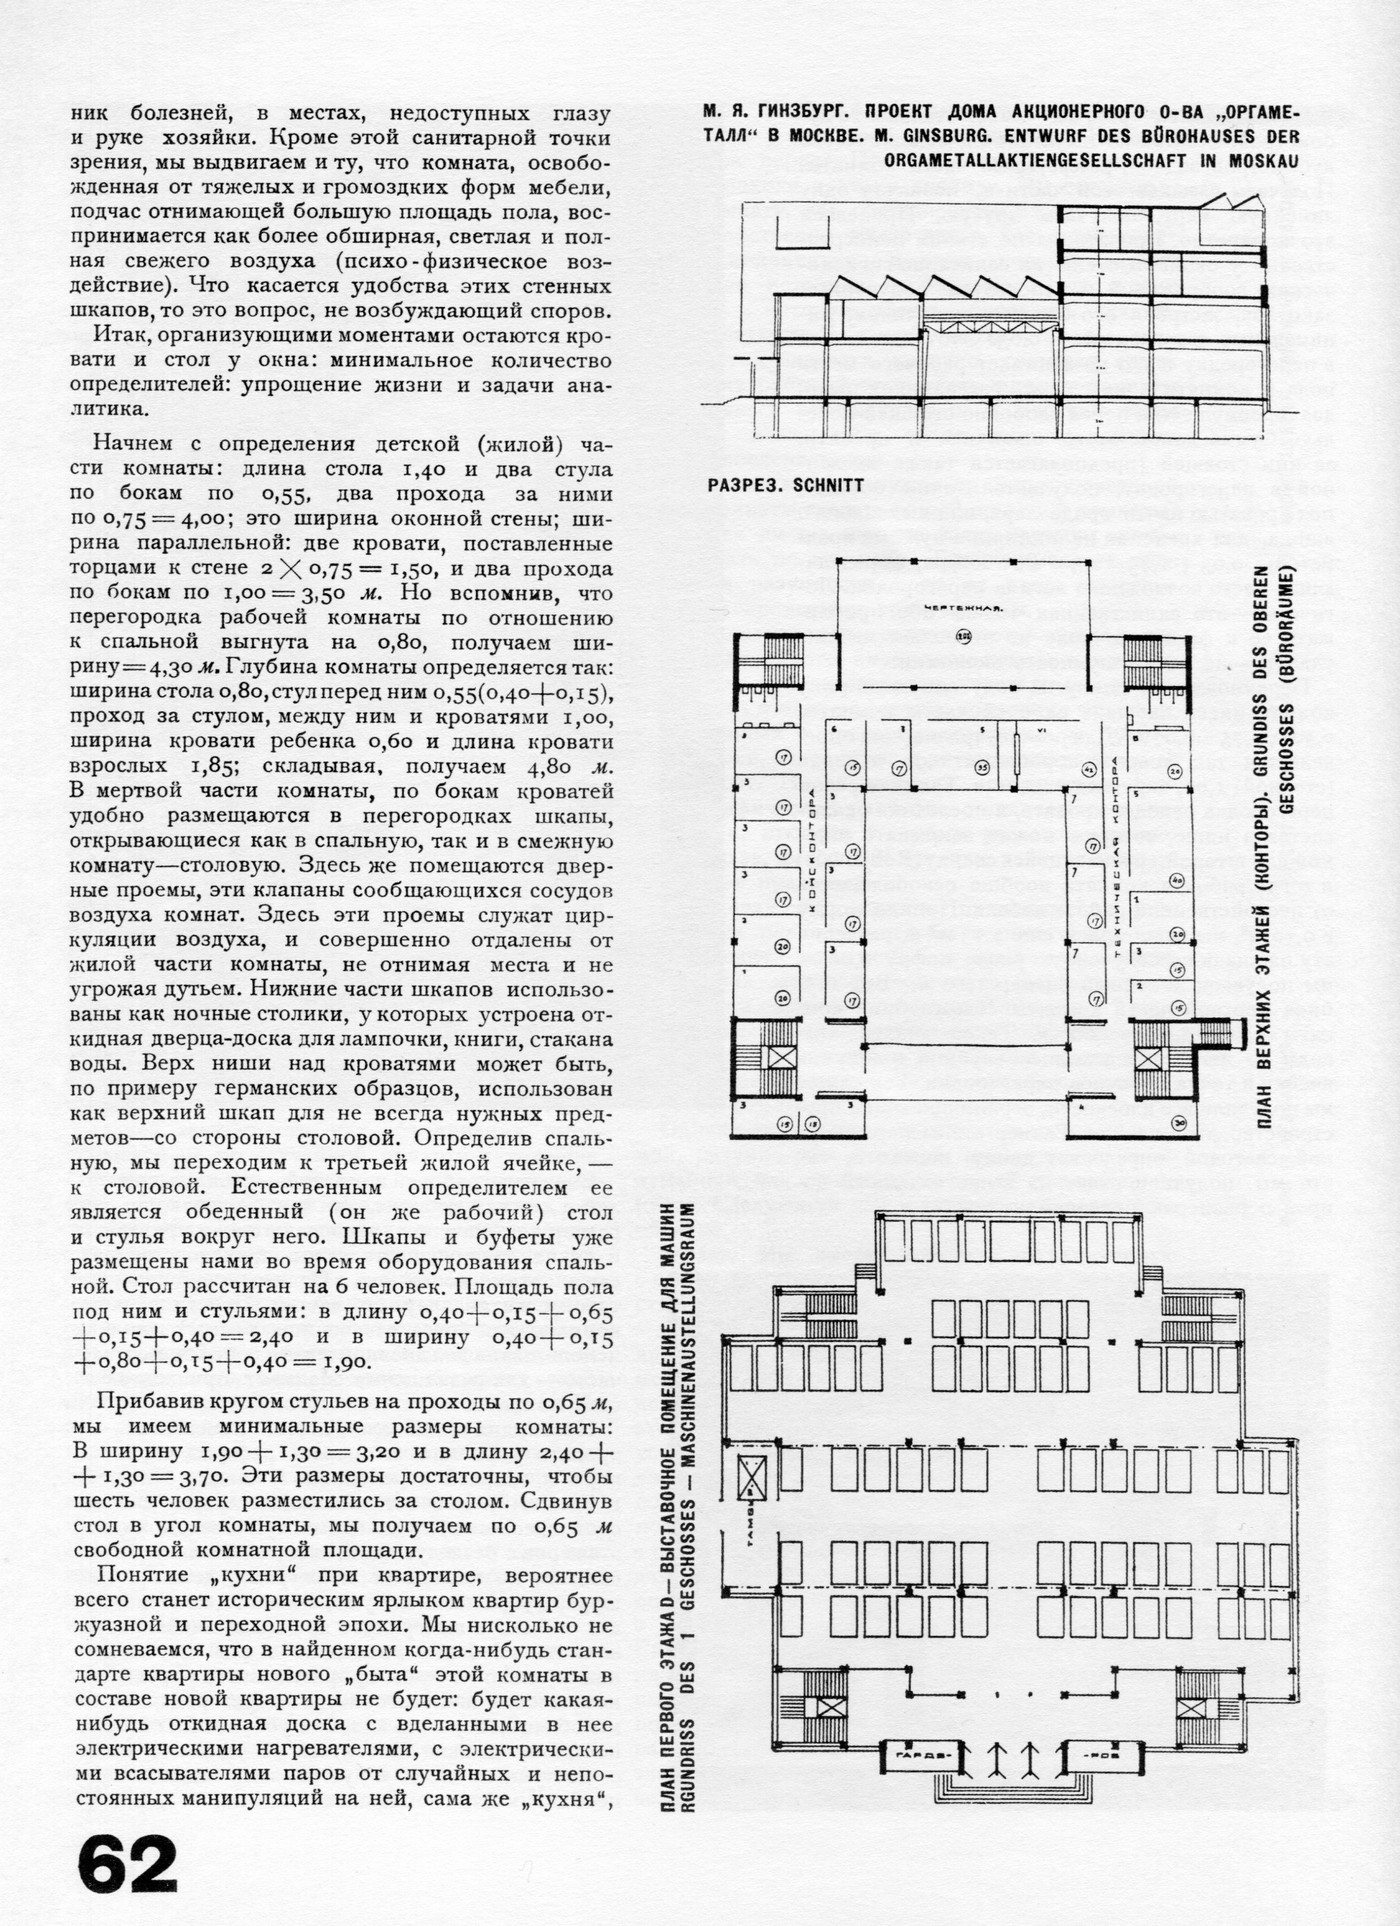 tehne.com-sa-1927-2-1400-018